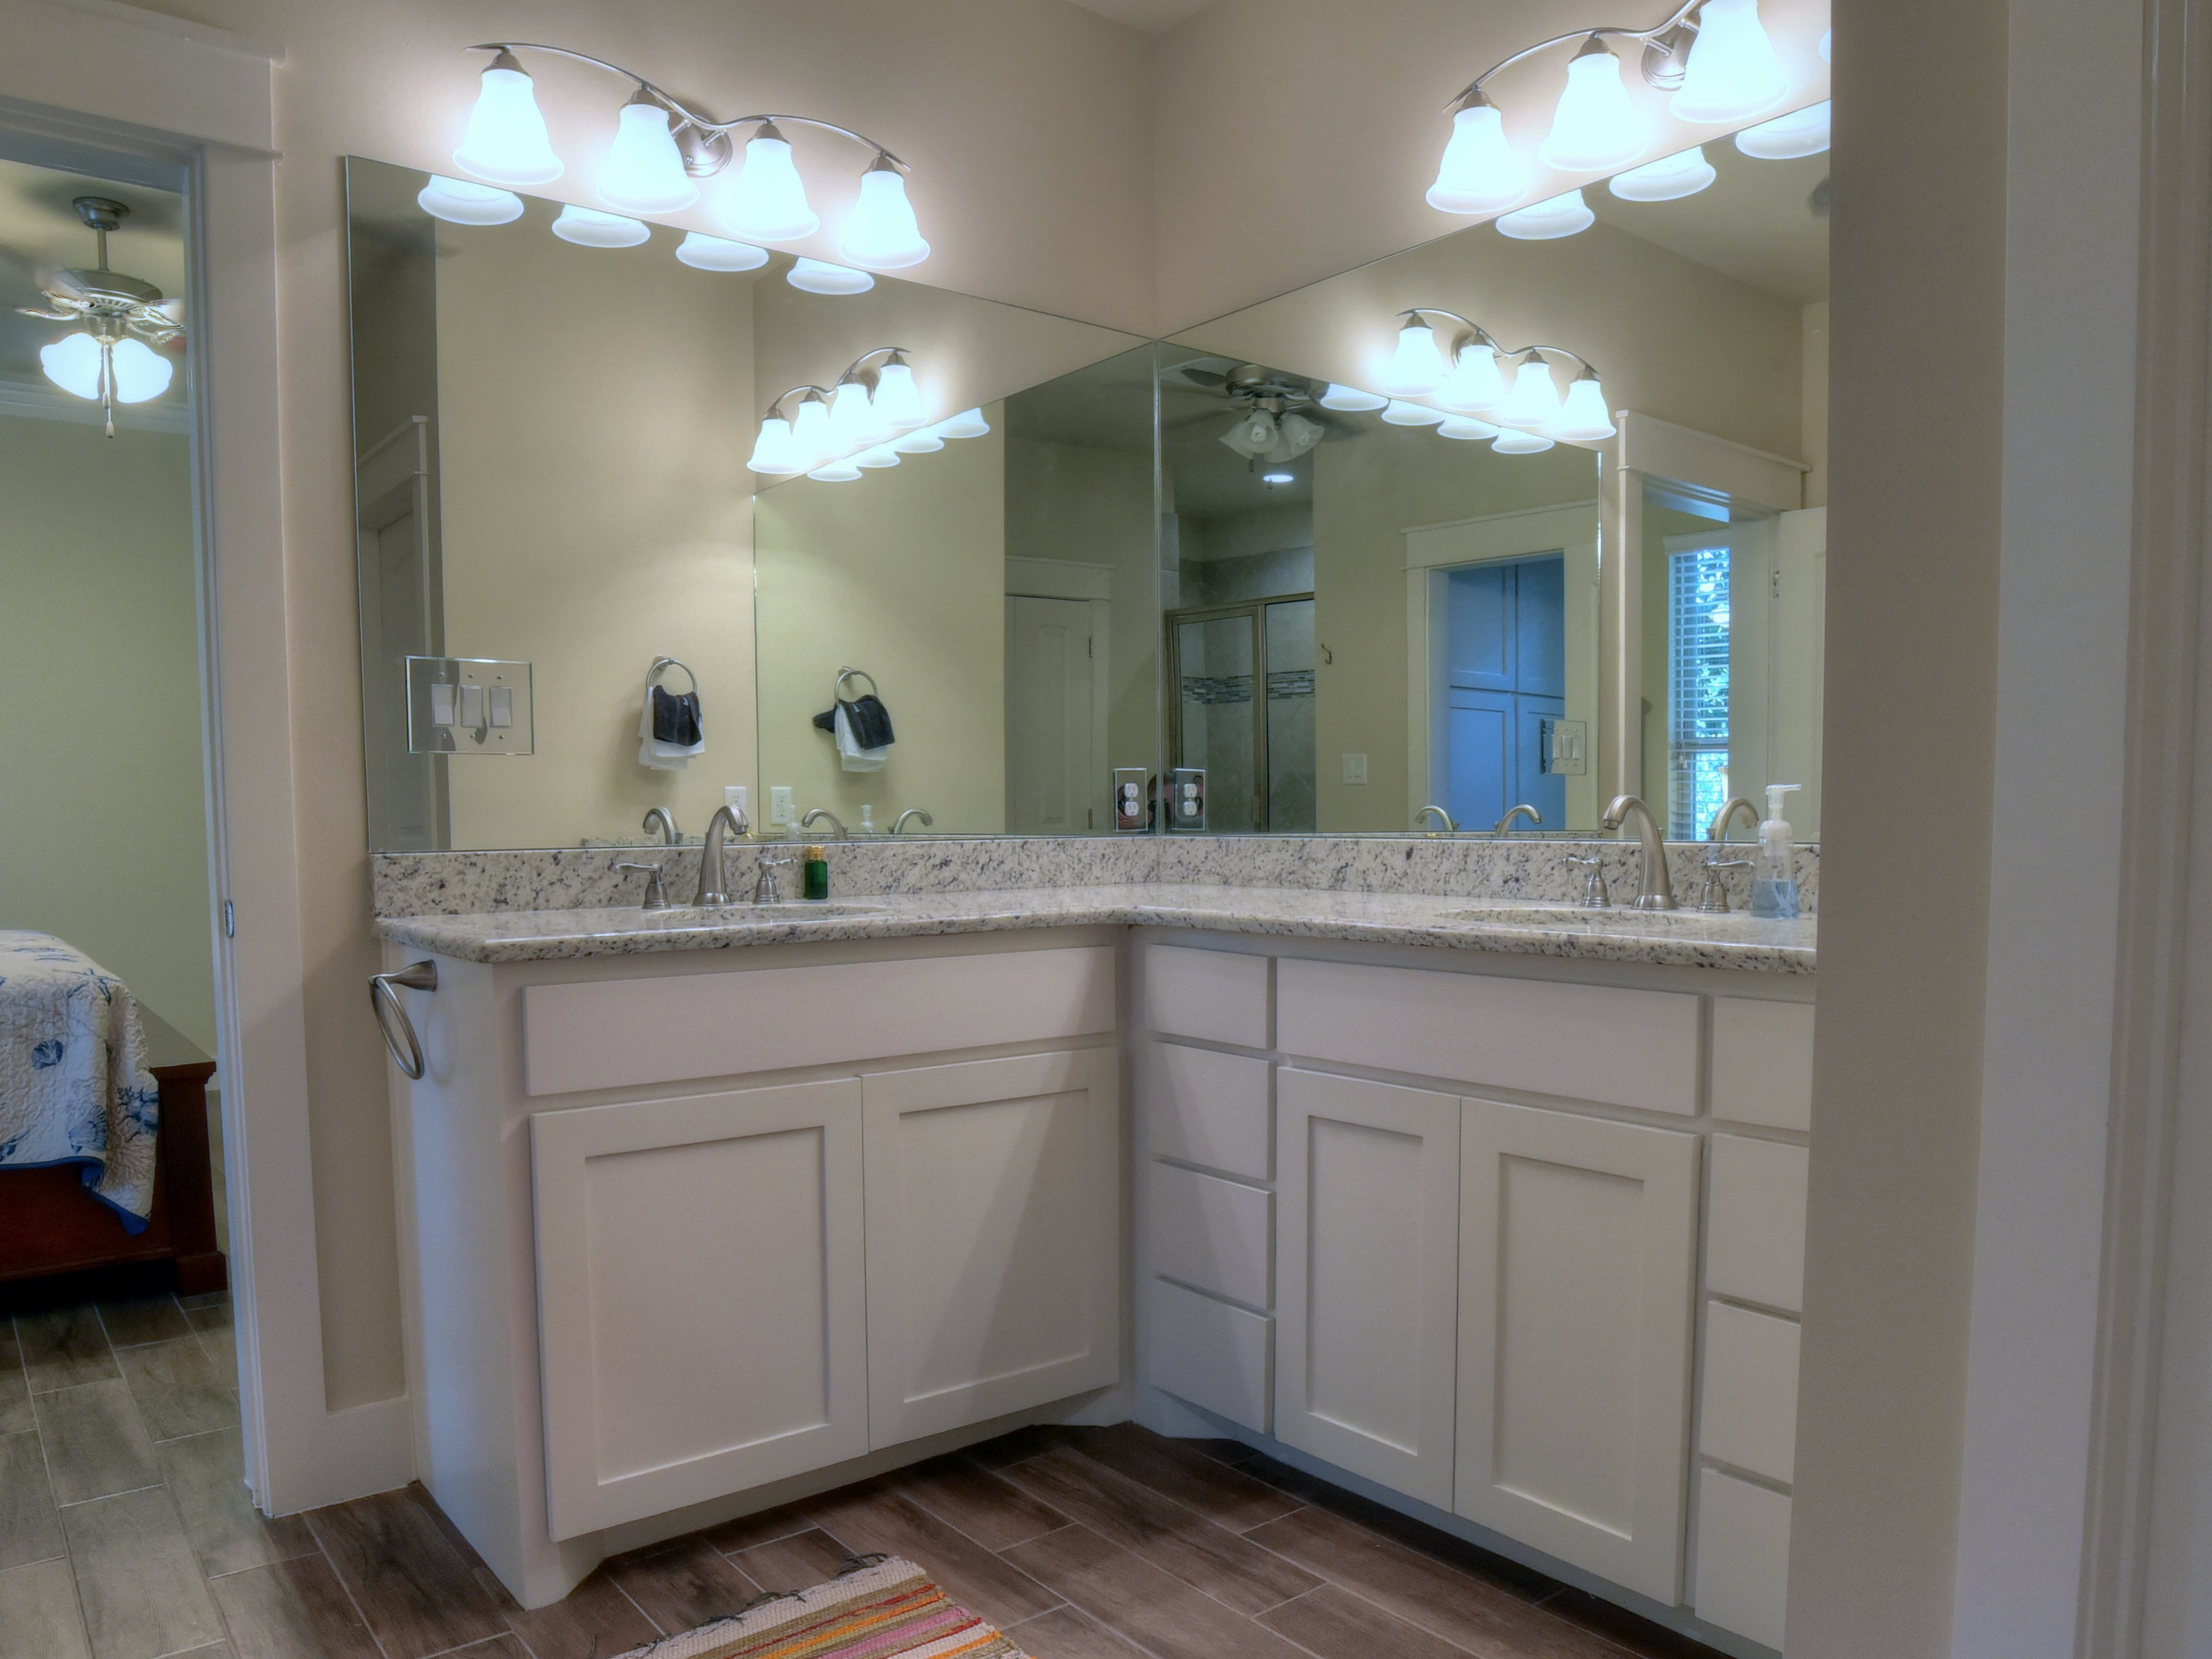 93 Beacon Point Condo rental in Sandestin Rentals ~ Cottages and Villas  in Destin Florida - #15